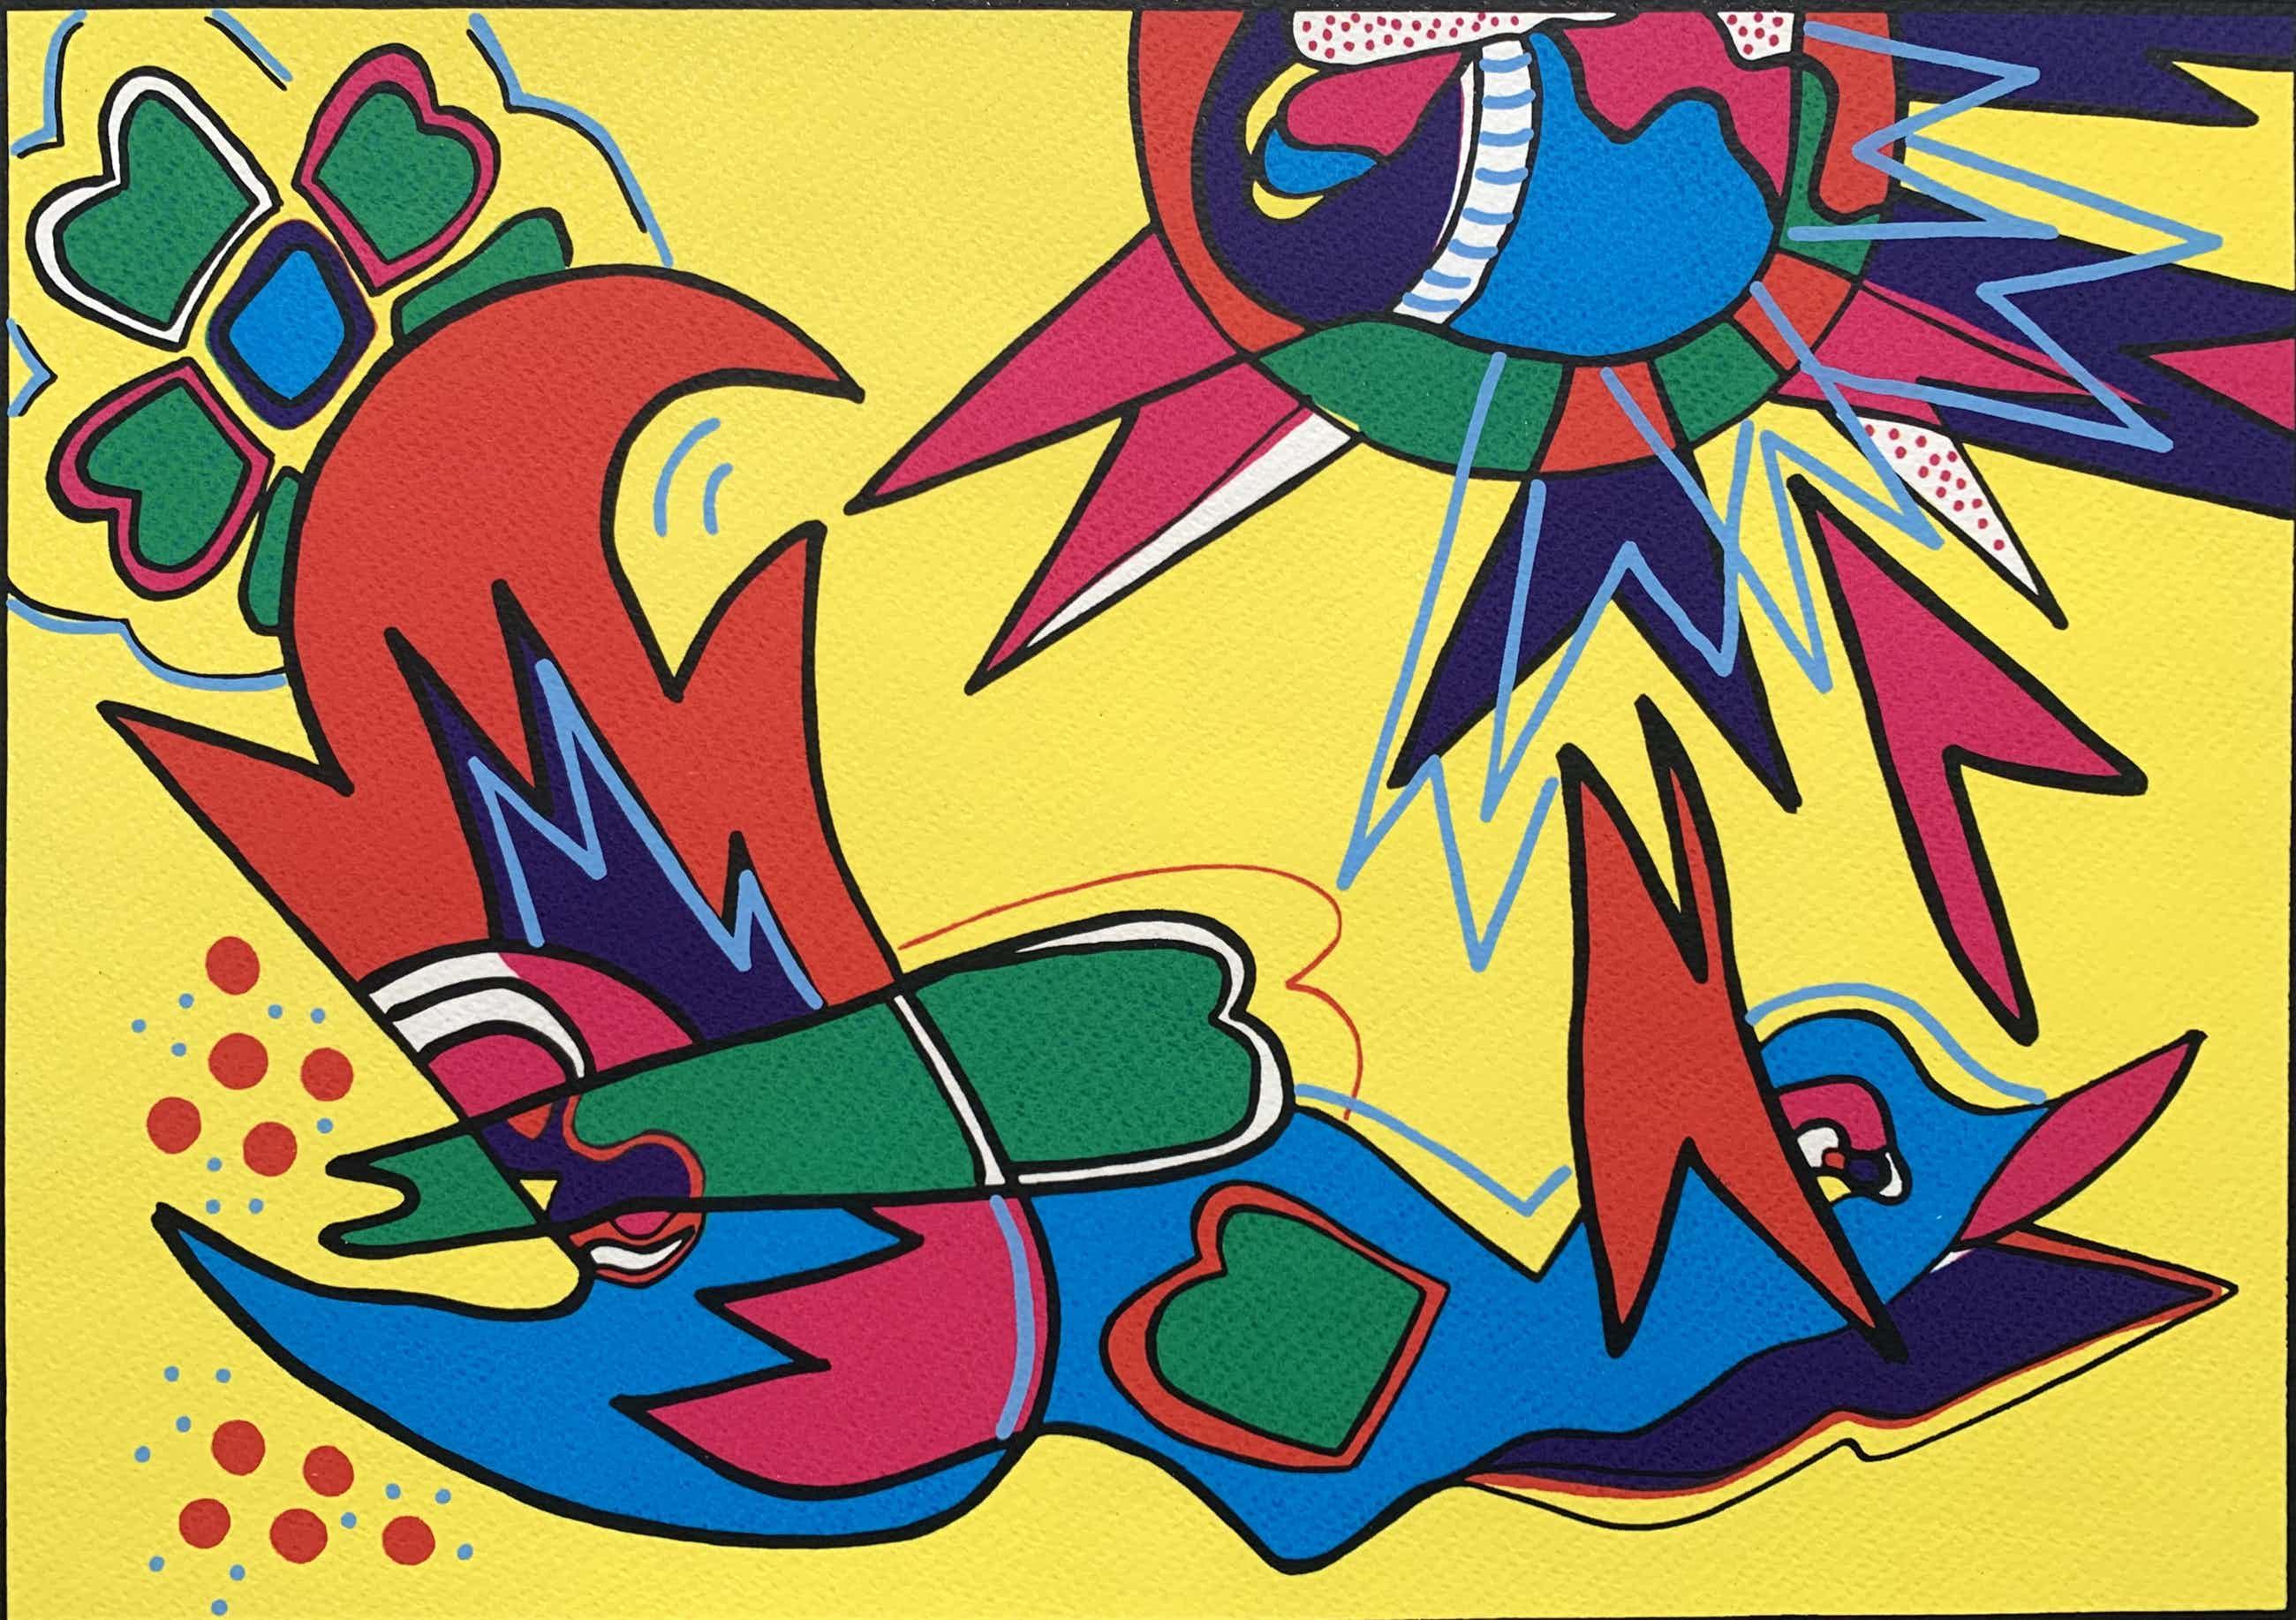 Marianne Naerebout - kleurenzeefdruk | 'Early bird' | 1995 kopen? Bied vanaf 80!